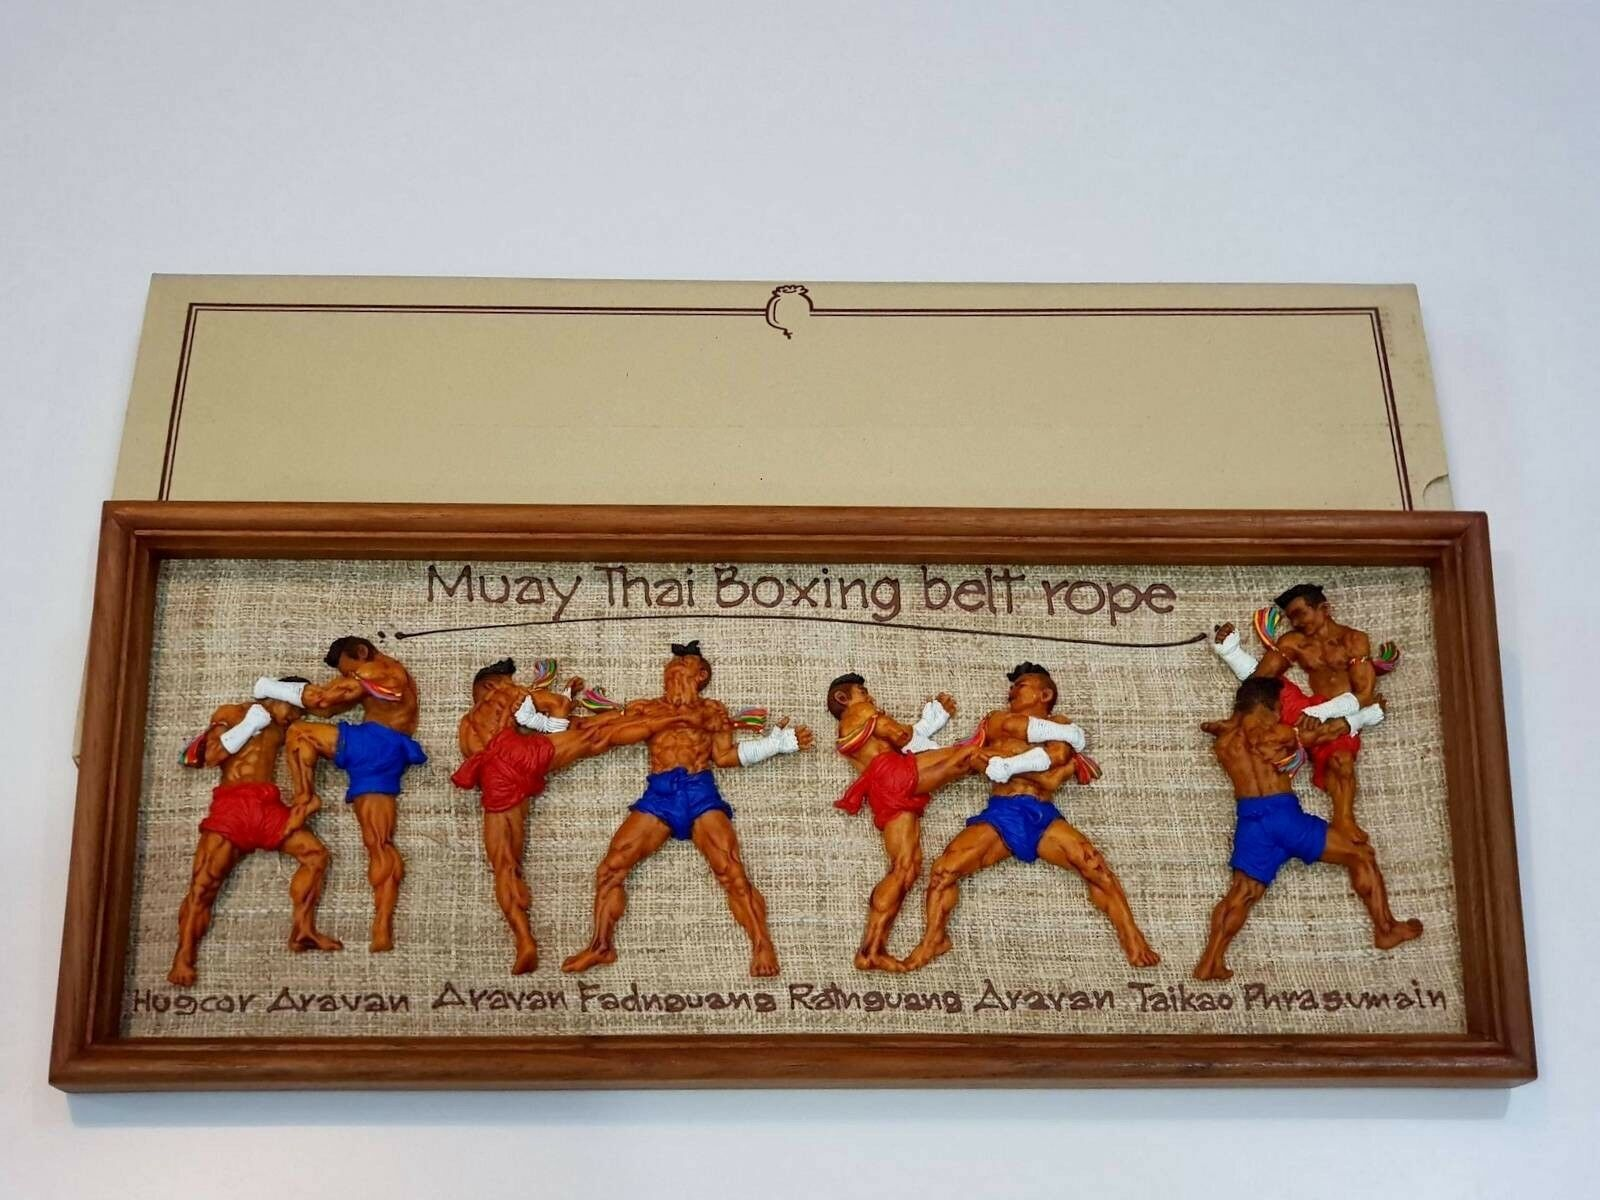 Souvenir frame sport boxing (Muay Thai Boxing belt rope )